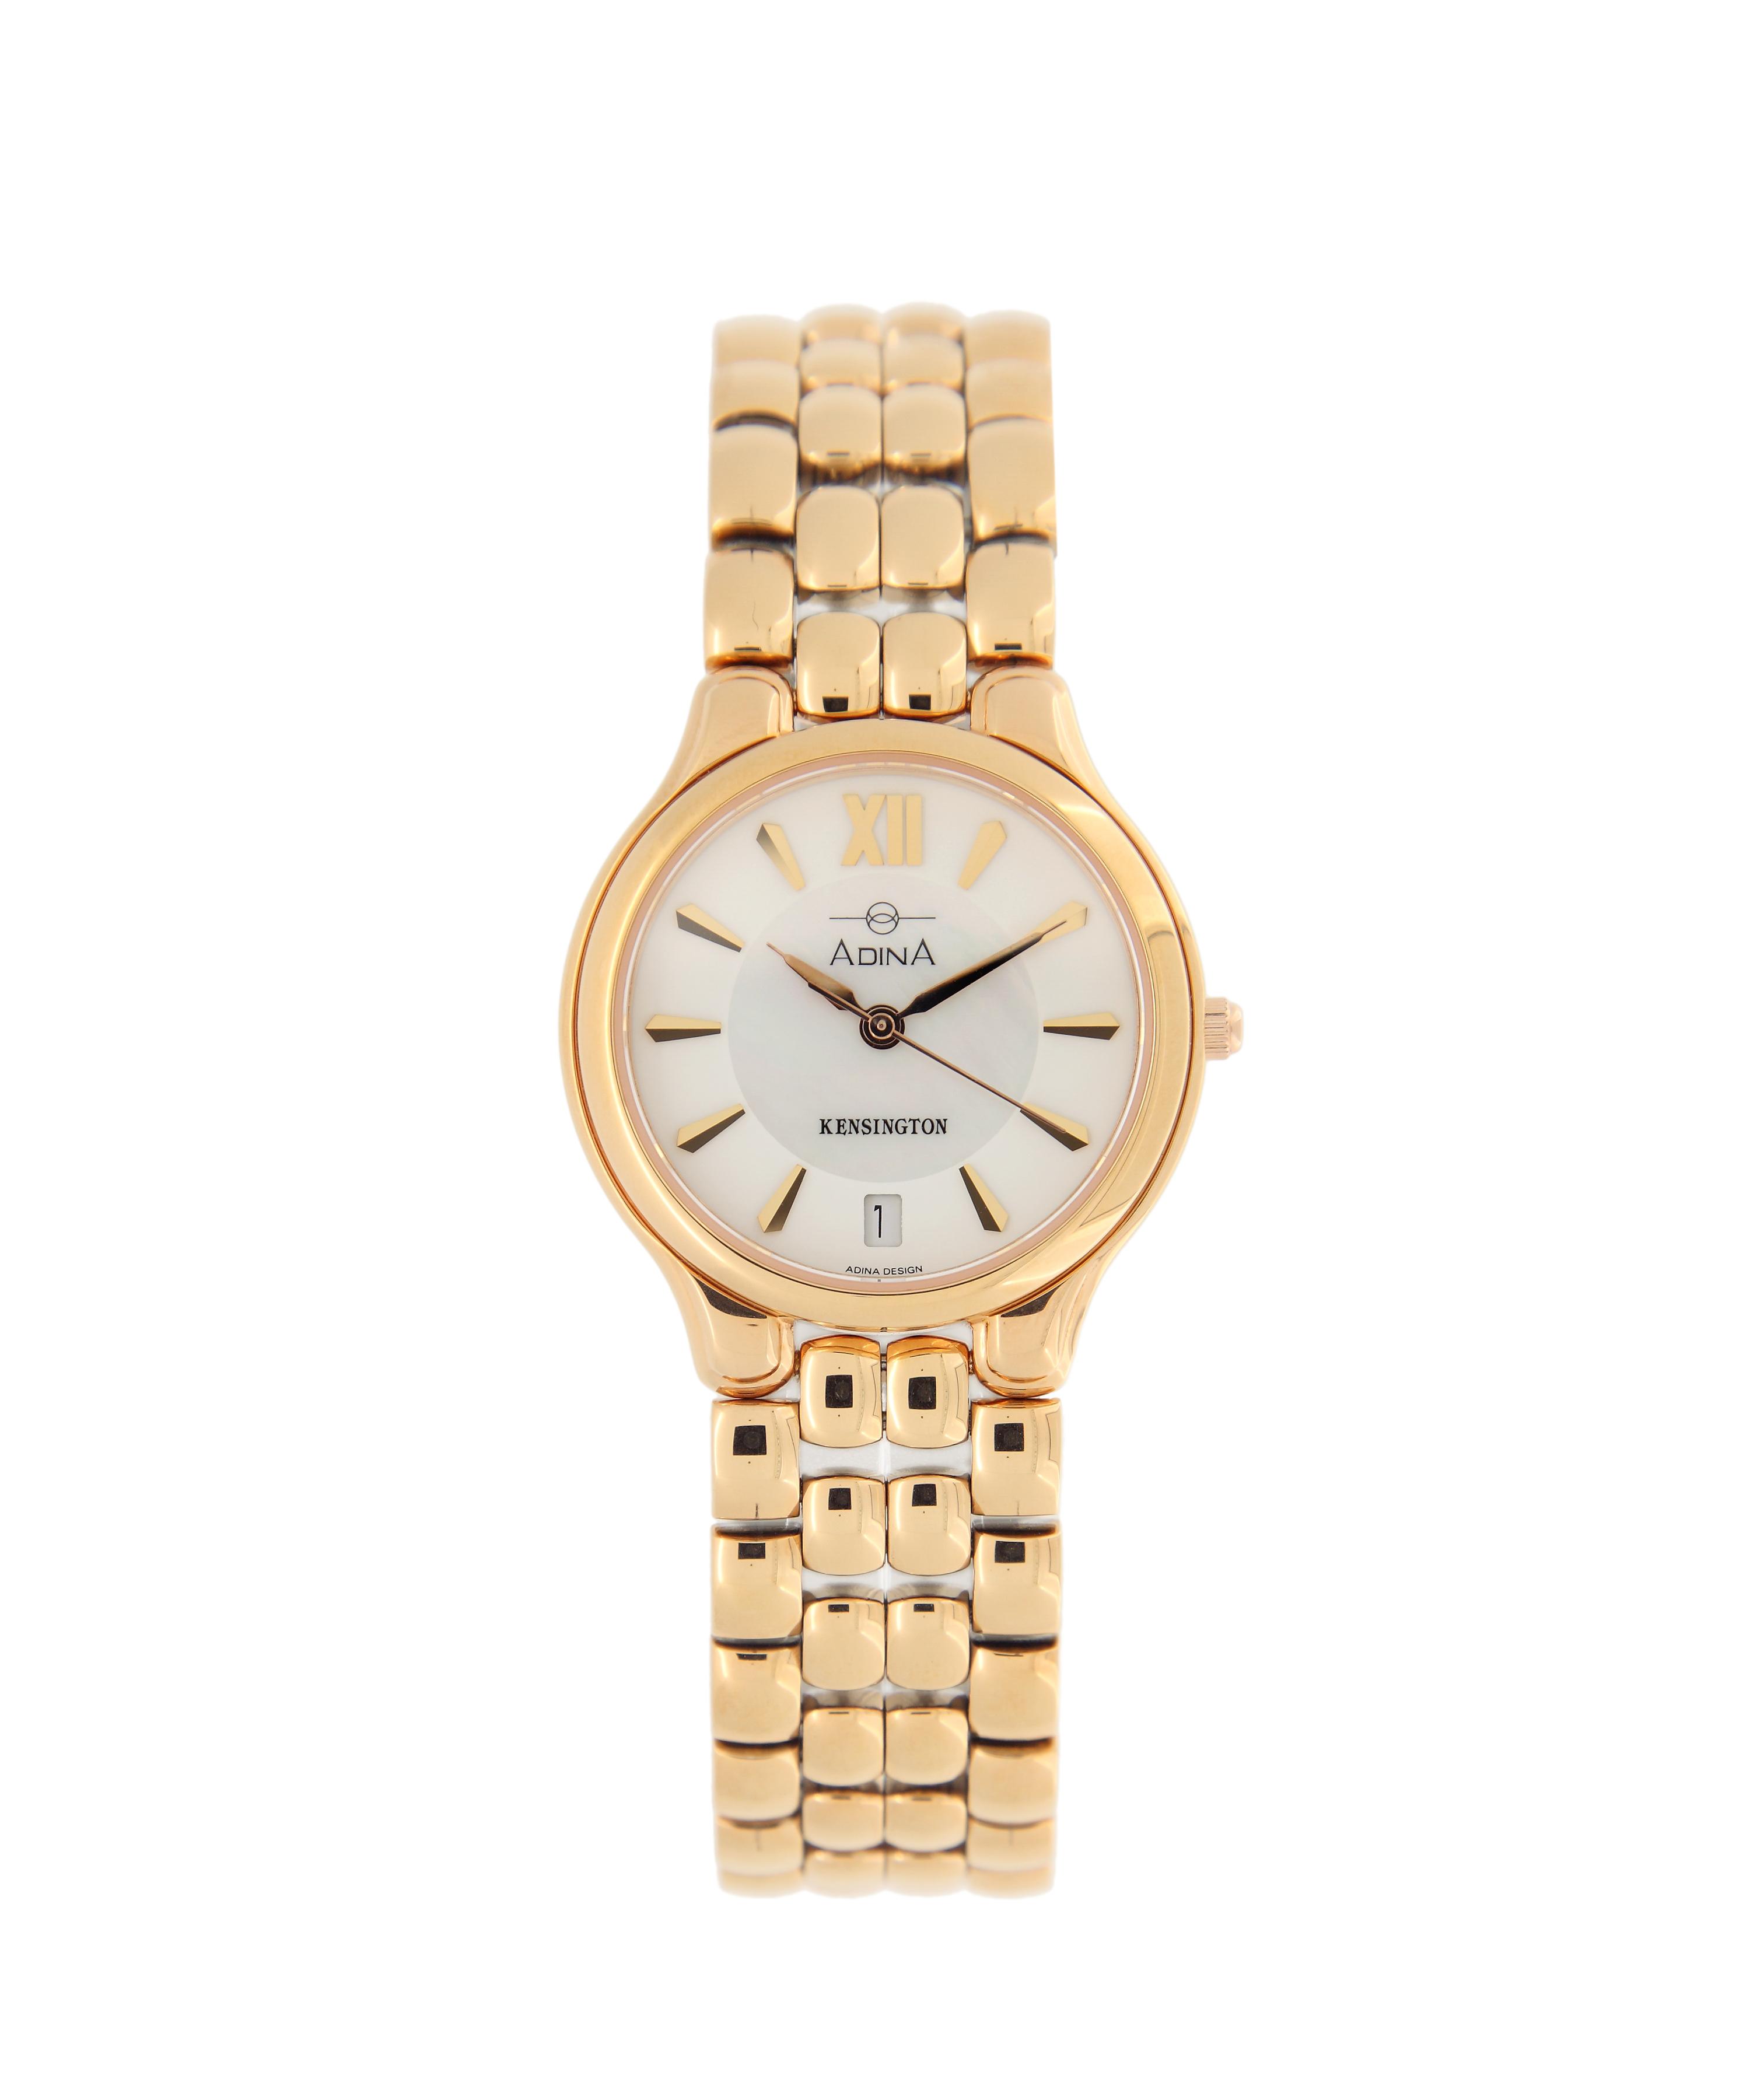 Adina Kensington Dress Watch YS17 R0XB